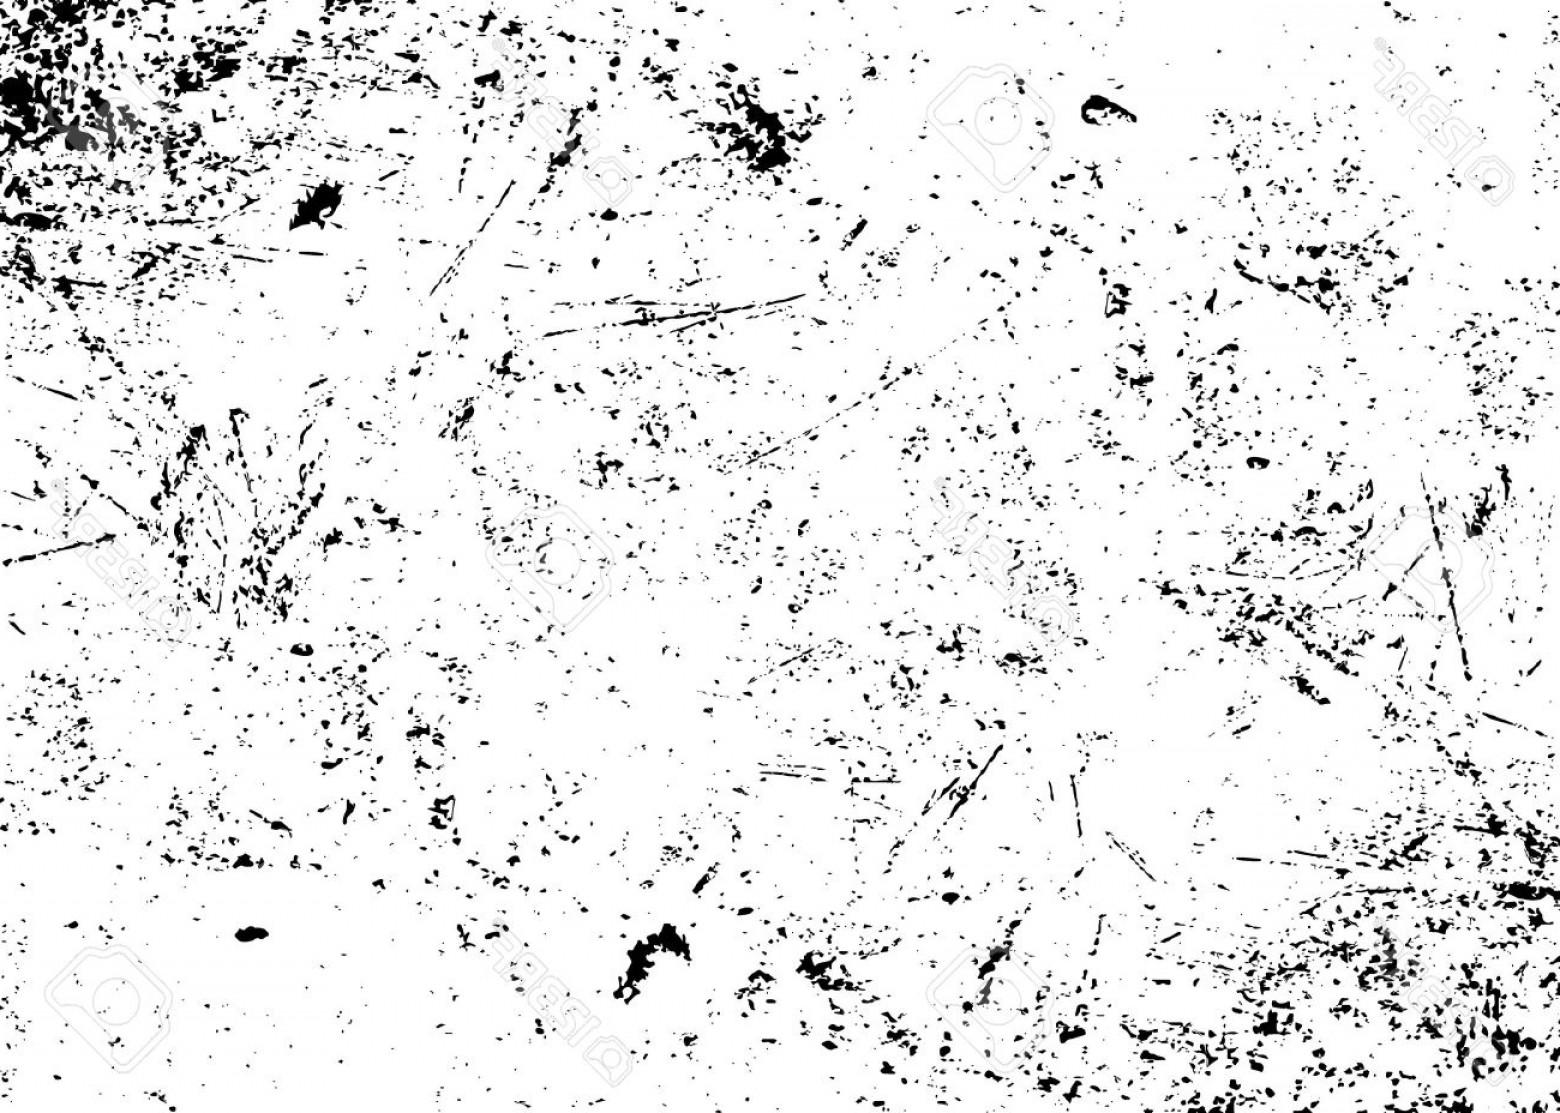 1560x1113 Distressed Vector Overlay Pattern Lazttweet